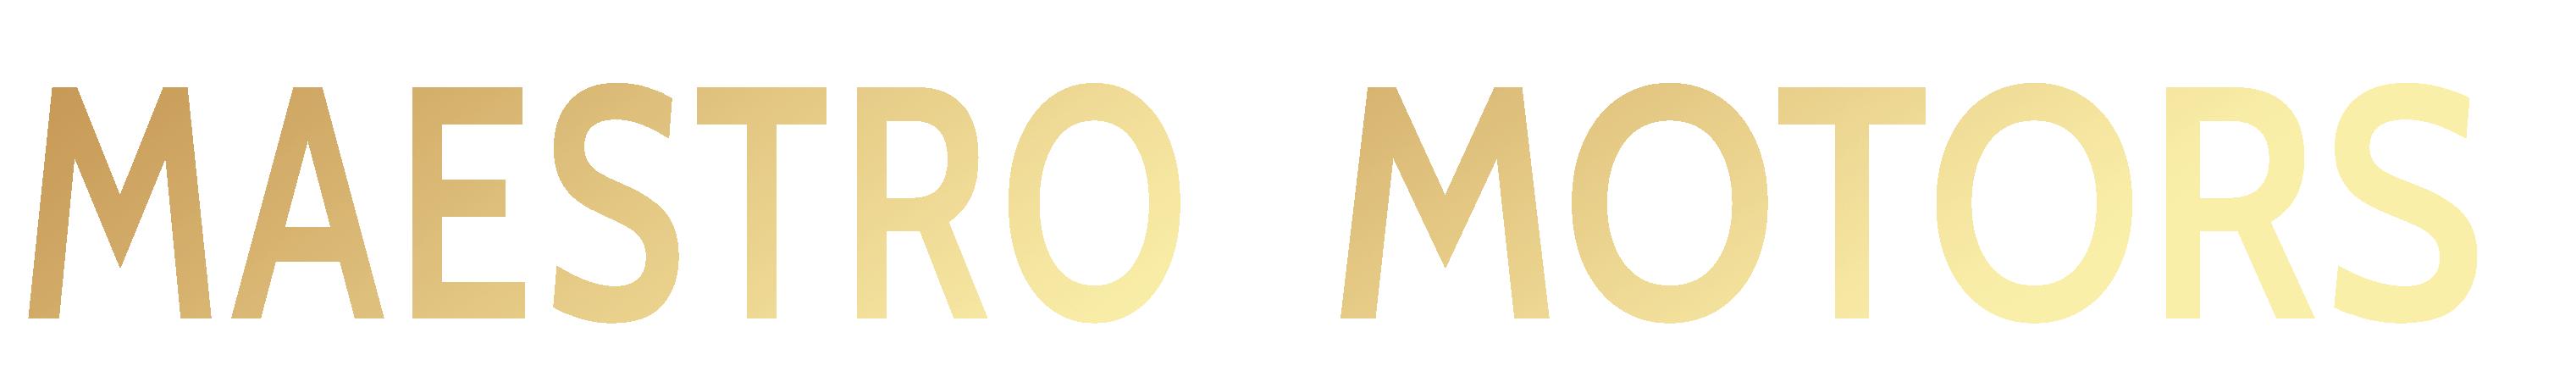 Maestro Motors